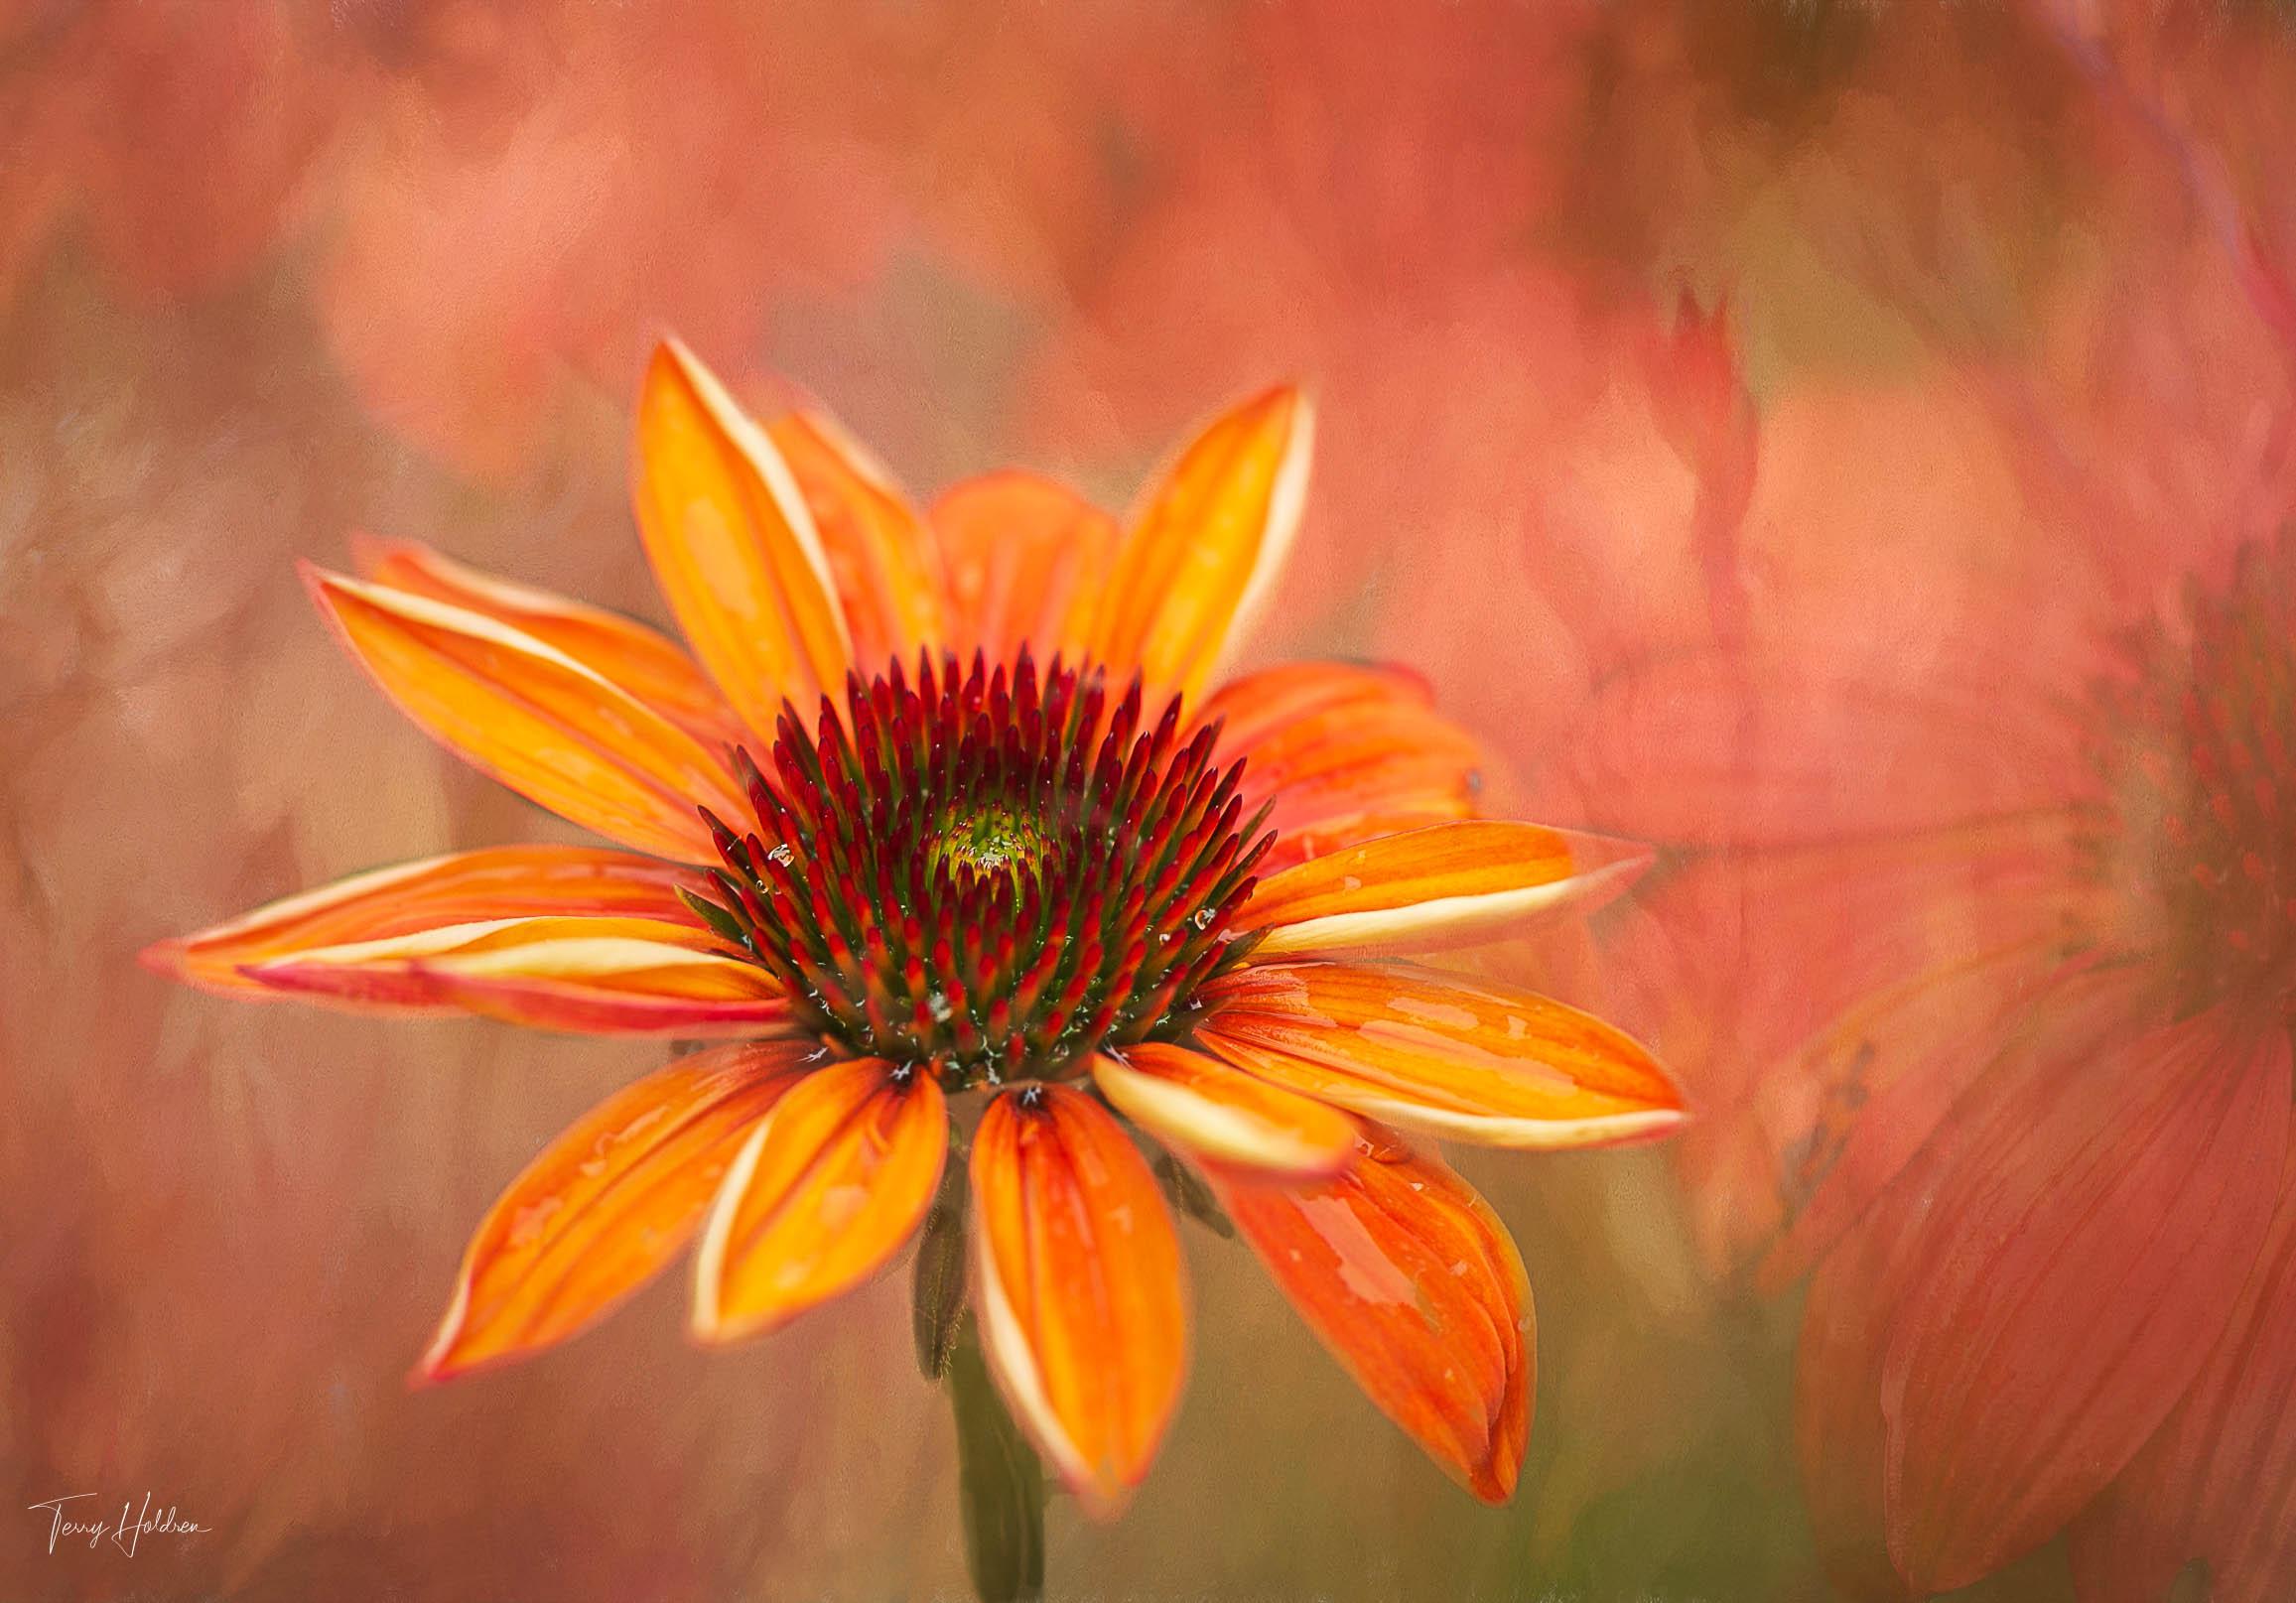 Copyright Terry Holdren 2020 iPhotography Textured flower photos 1